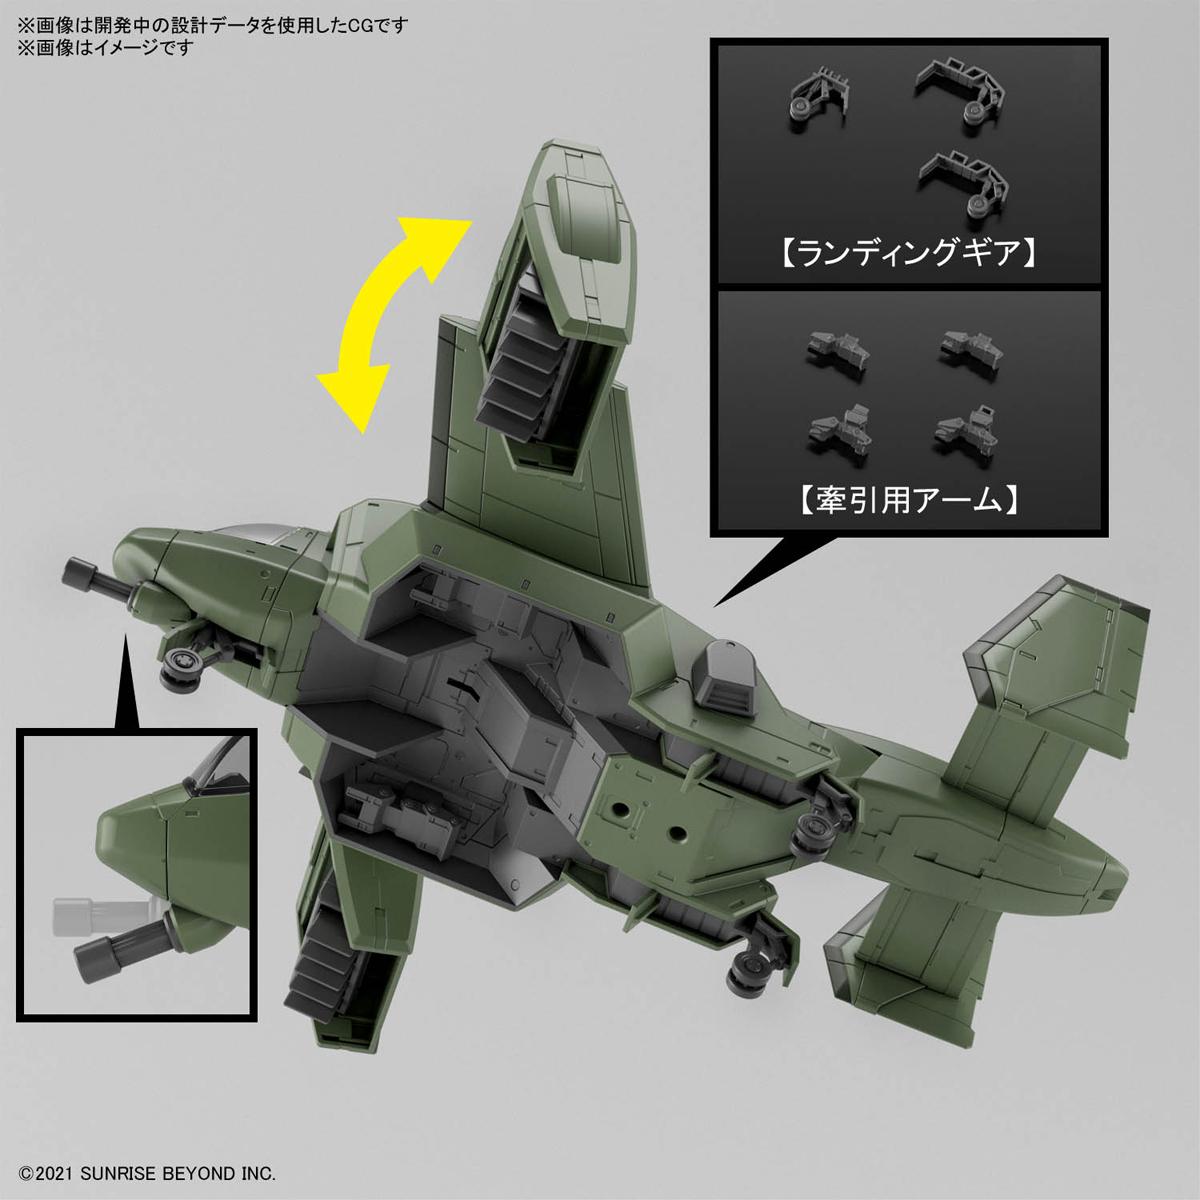 HG 1/72『ブレイディハウンド』境界戦機 プラモデル-009